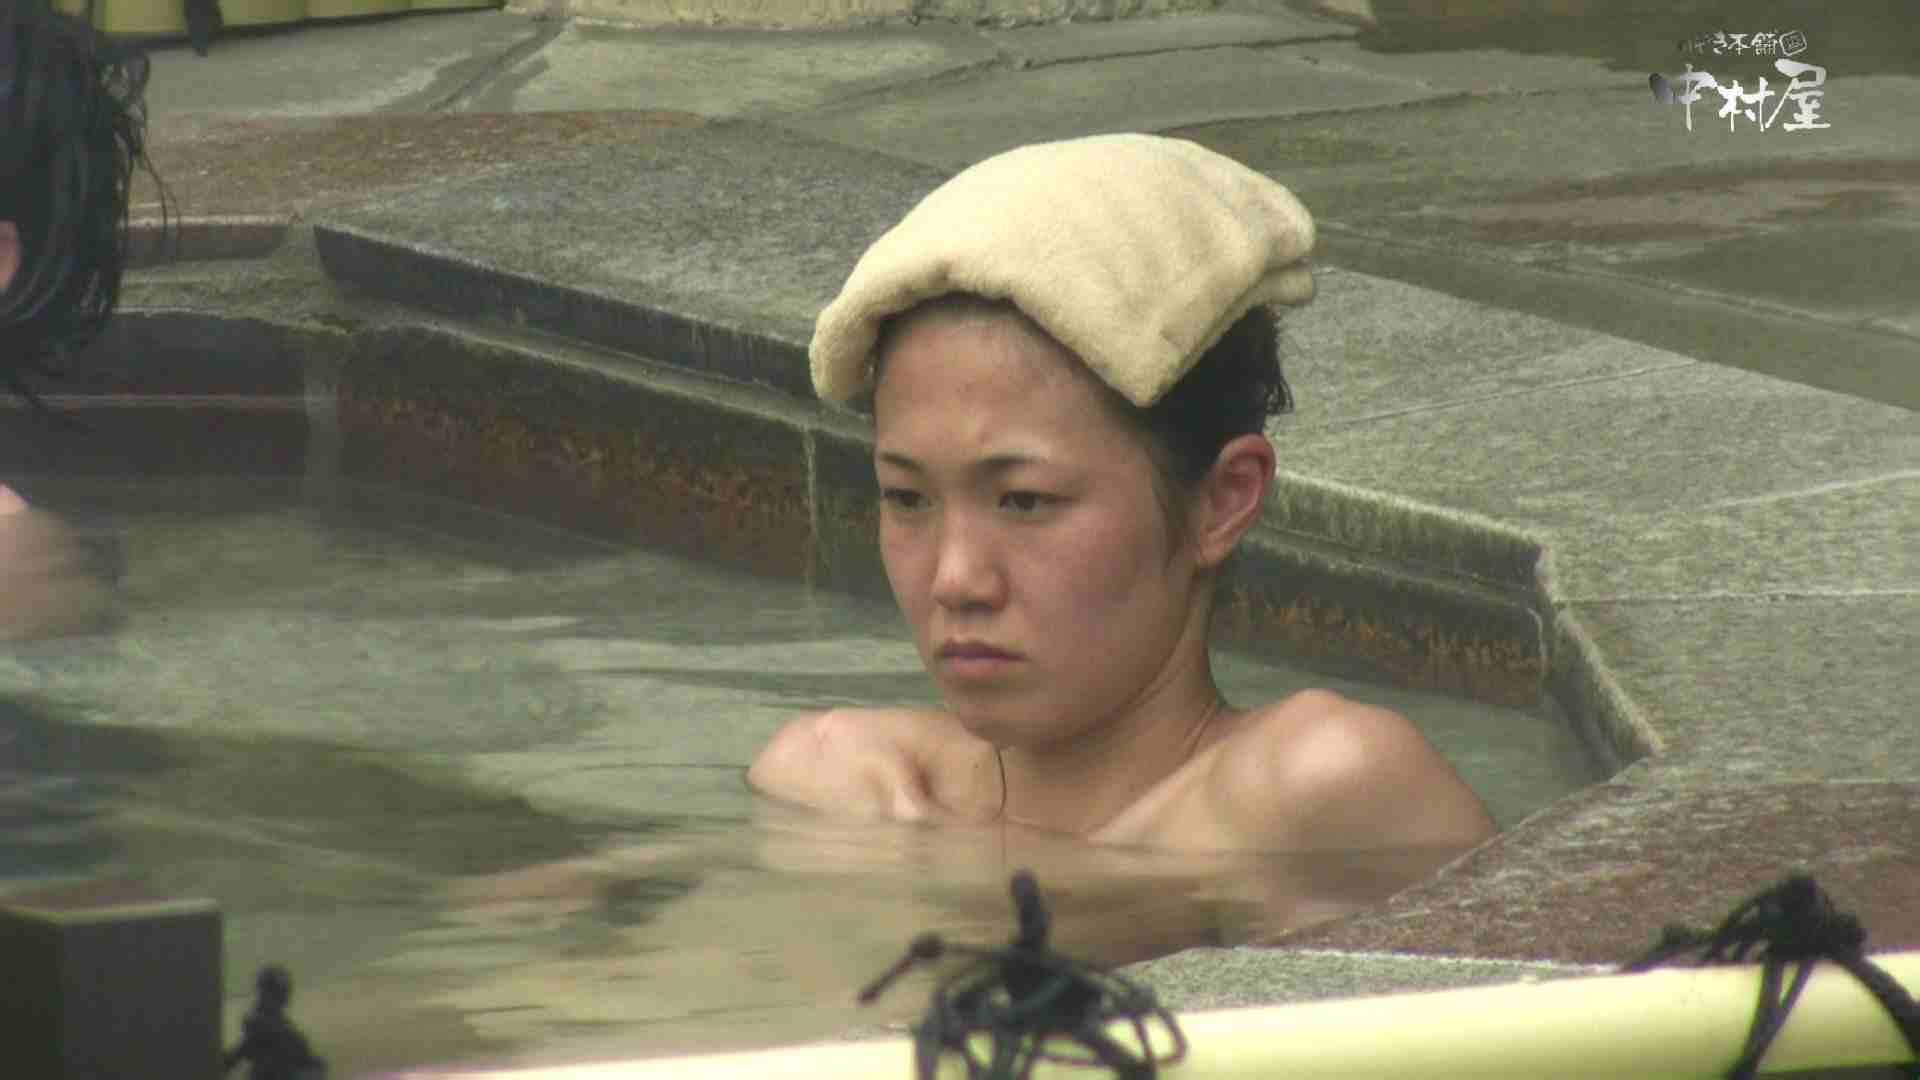 Aquaな露天風呂Vol.889 0   0  87連発 83